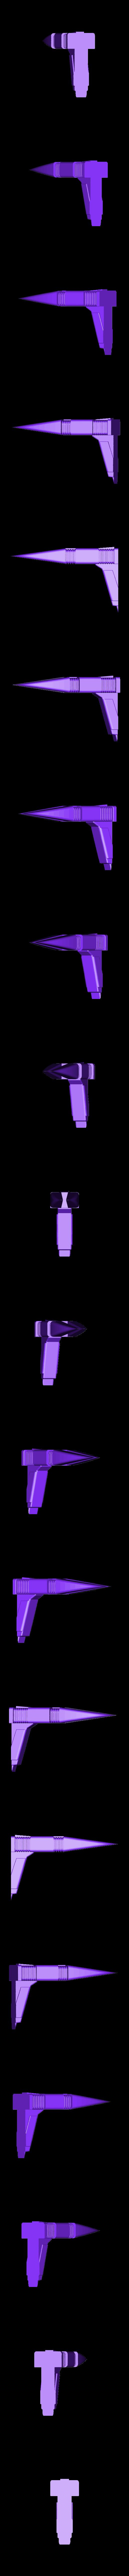 Voyager_Compression_rifle_part_4.stl Download free STL file Star Trek Voyager Compression Rifle • 3D print design, poblocki1982